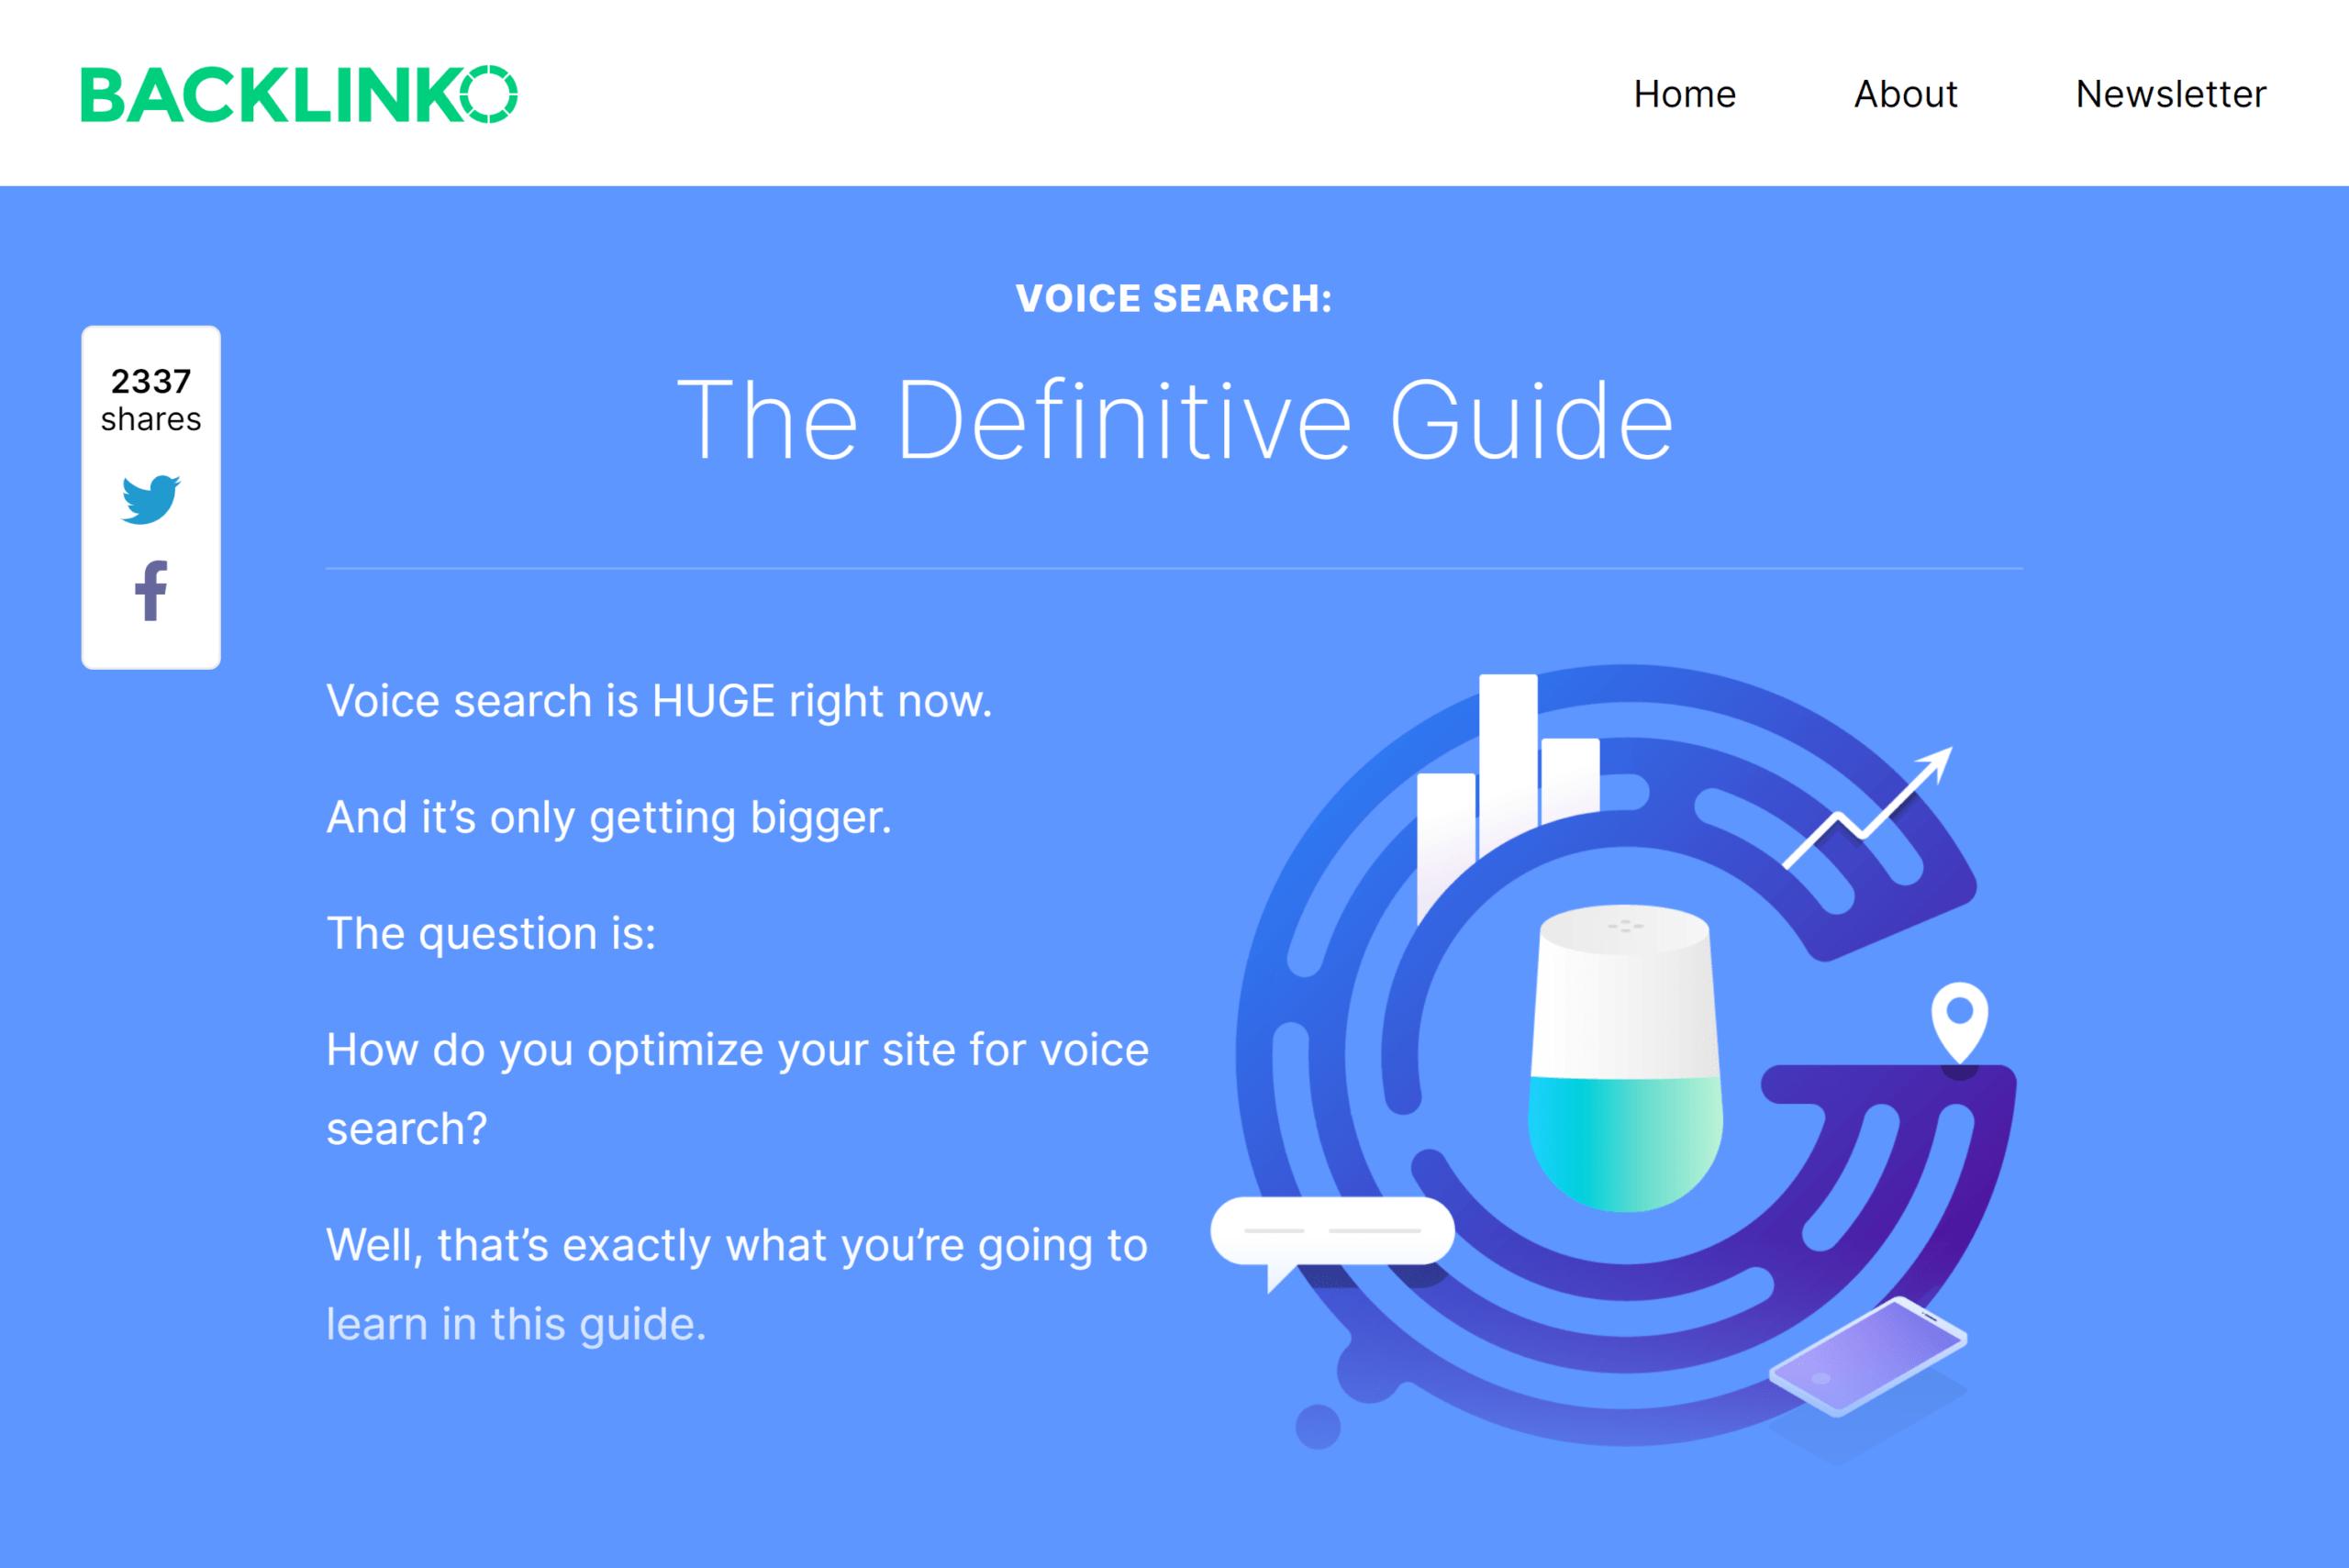 Backlinko – Optimize for voice search